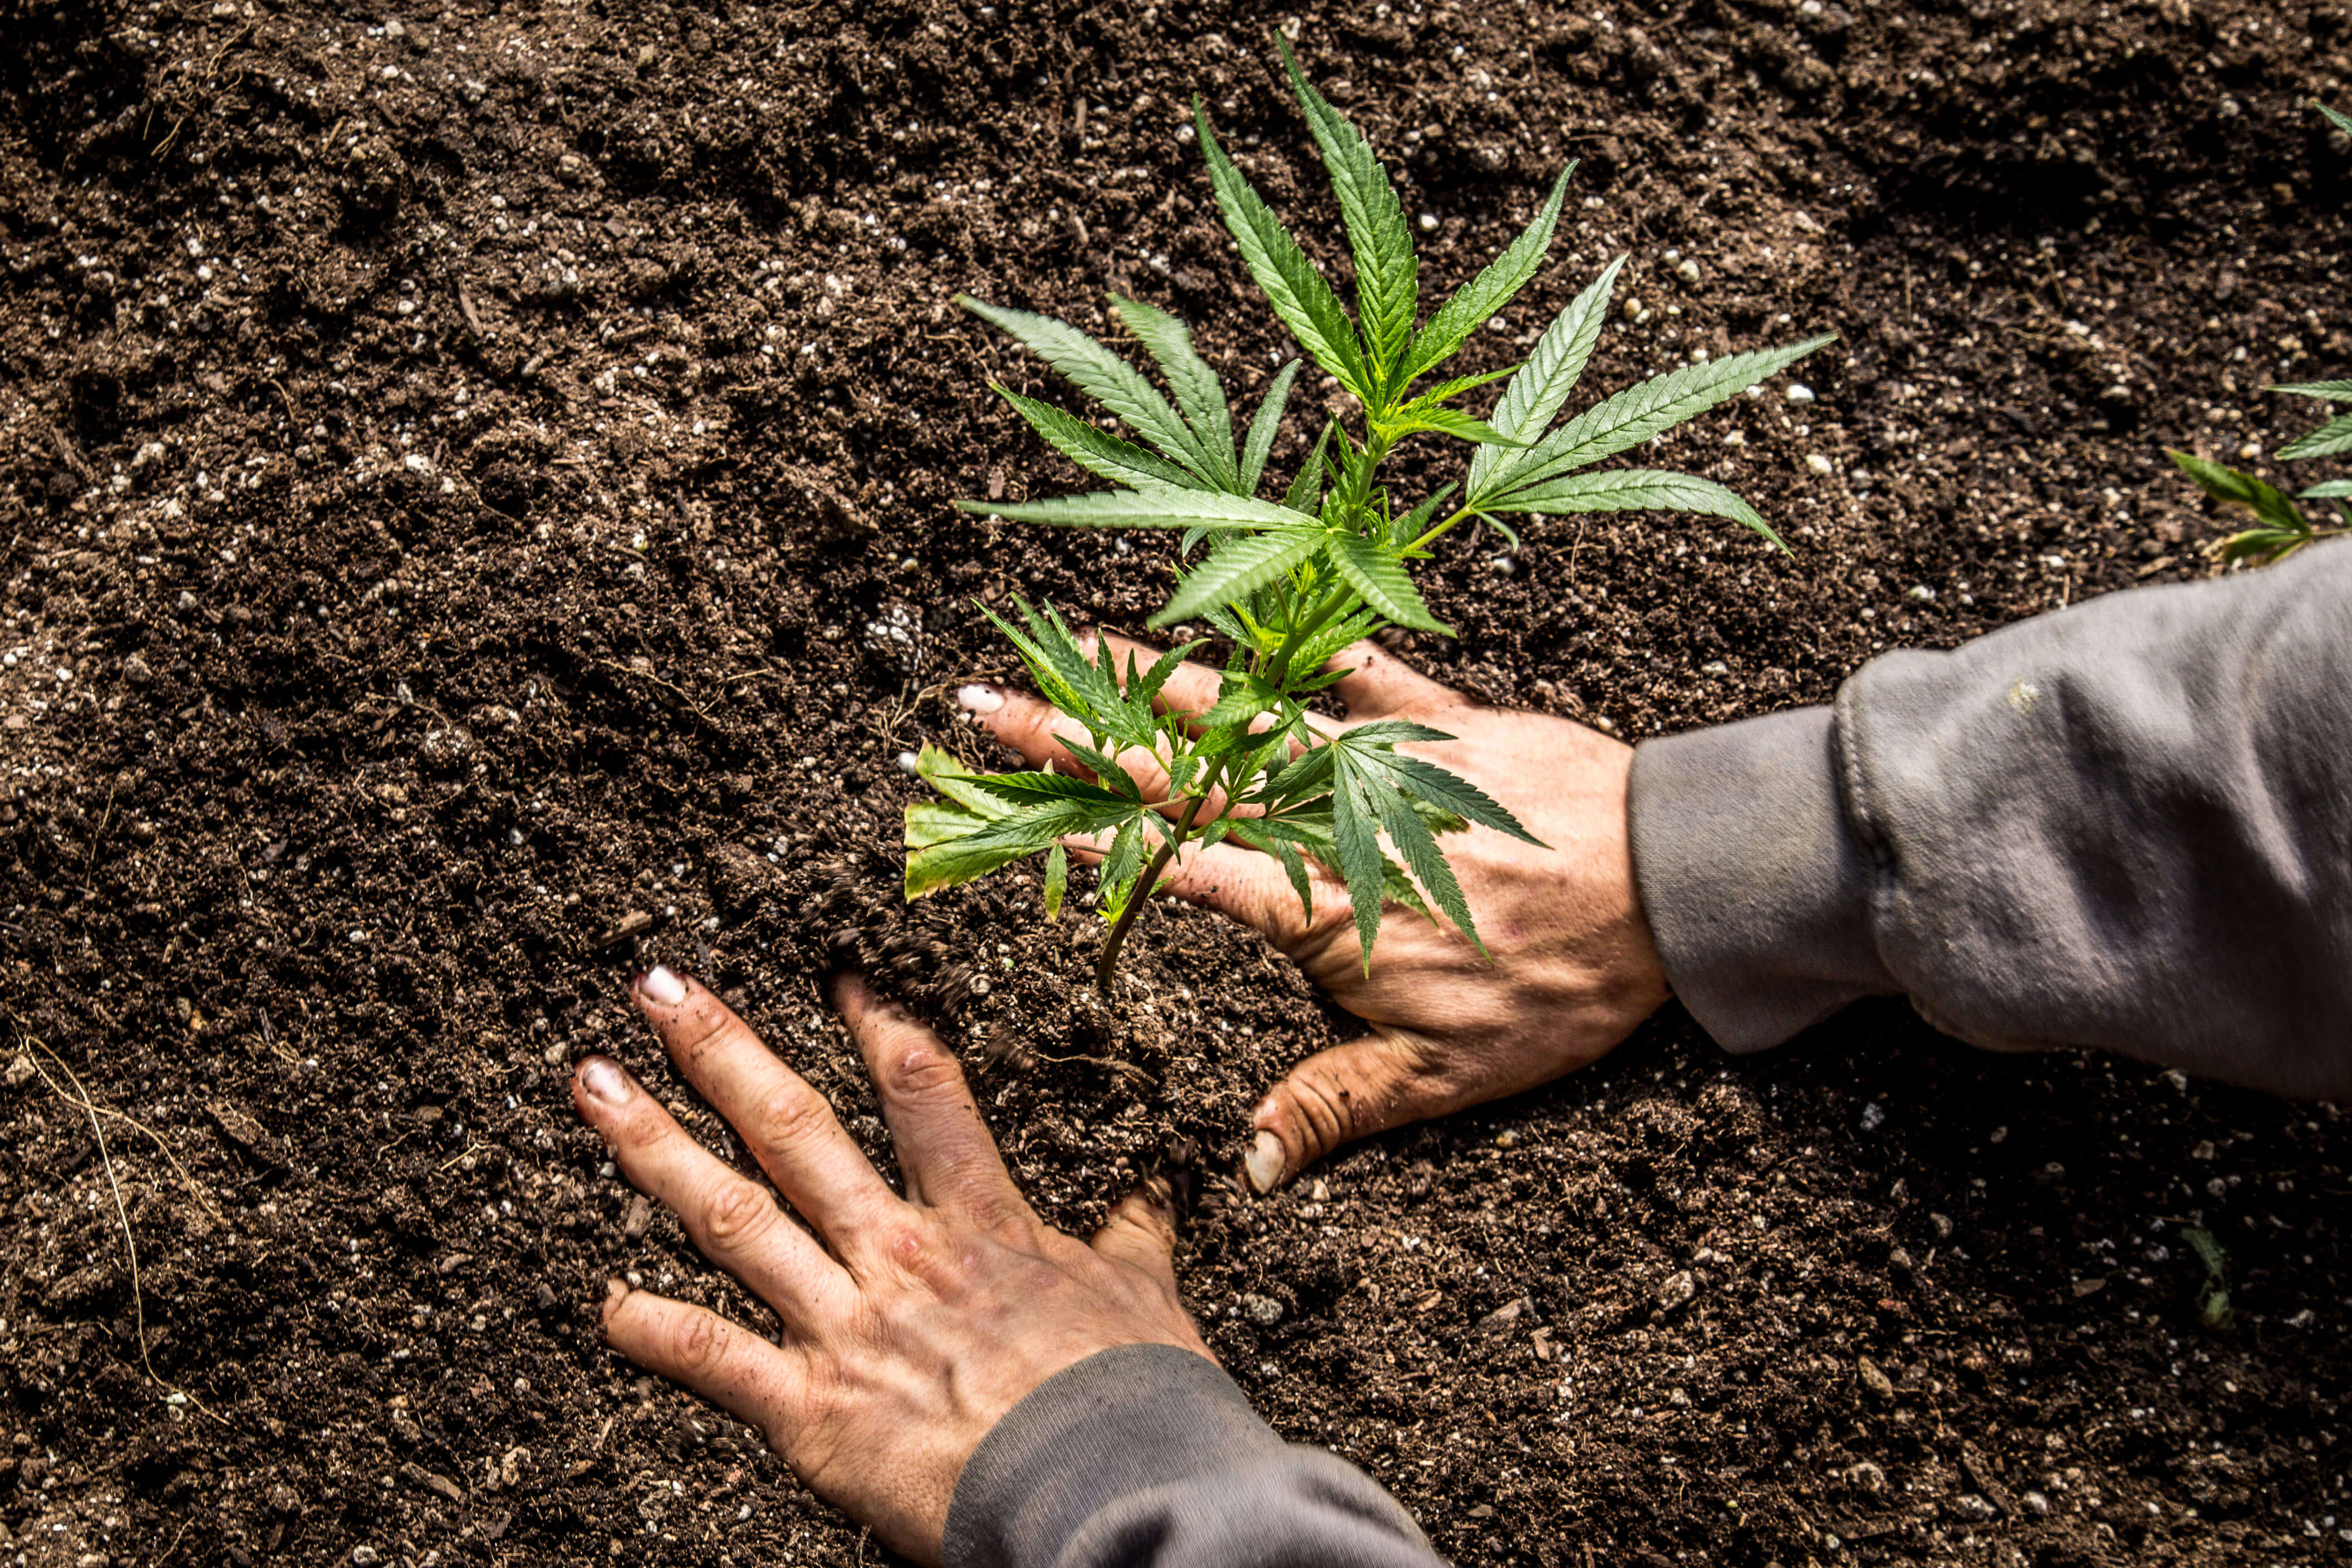 Planting Cannabis in Soil